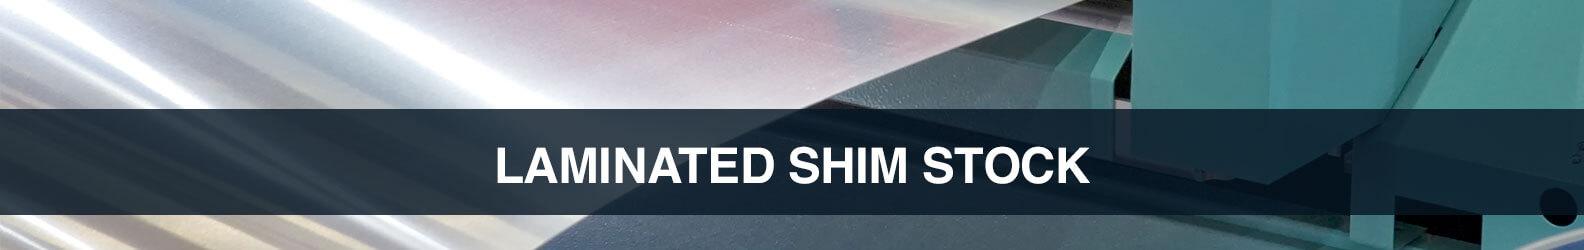 LAMINATED SHIM STOCK